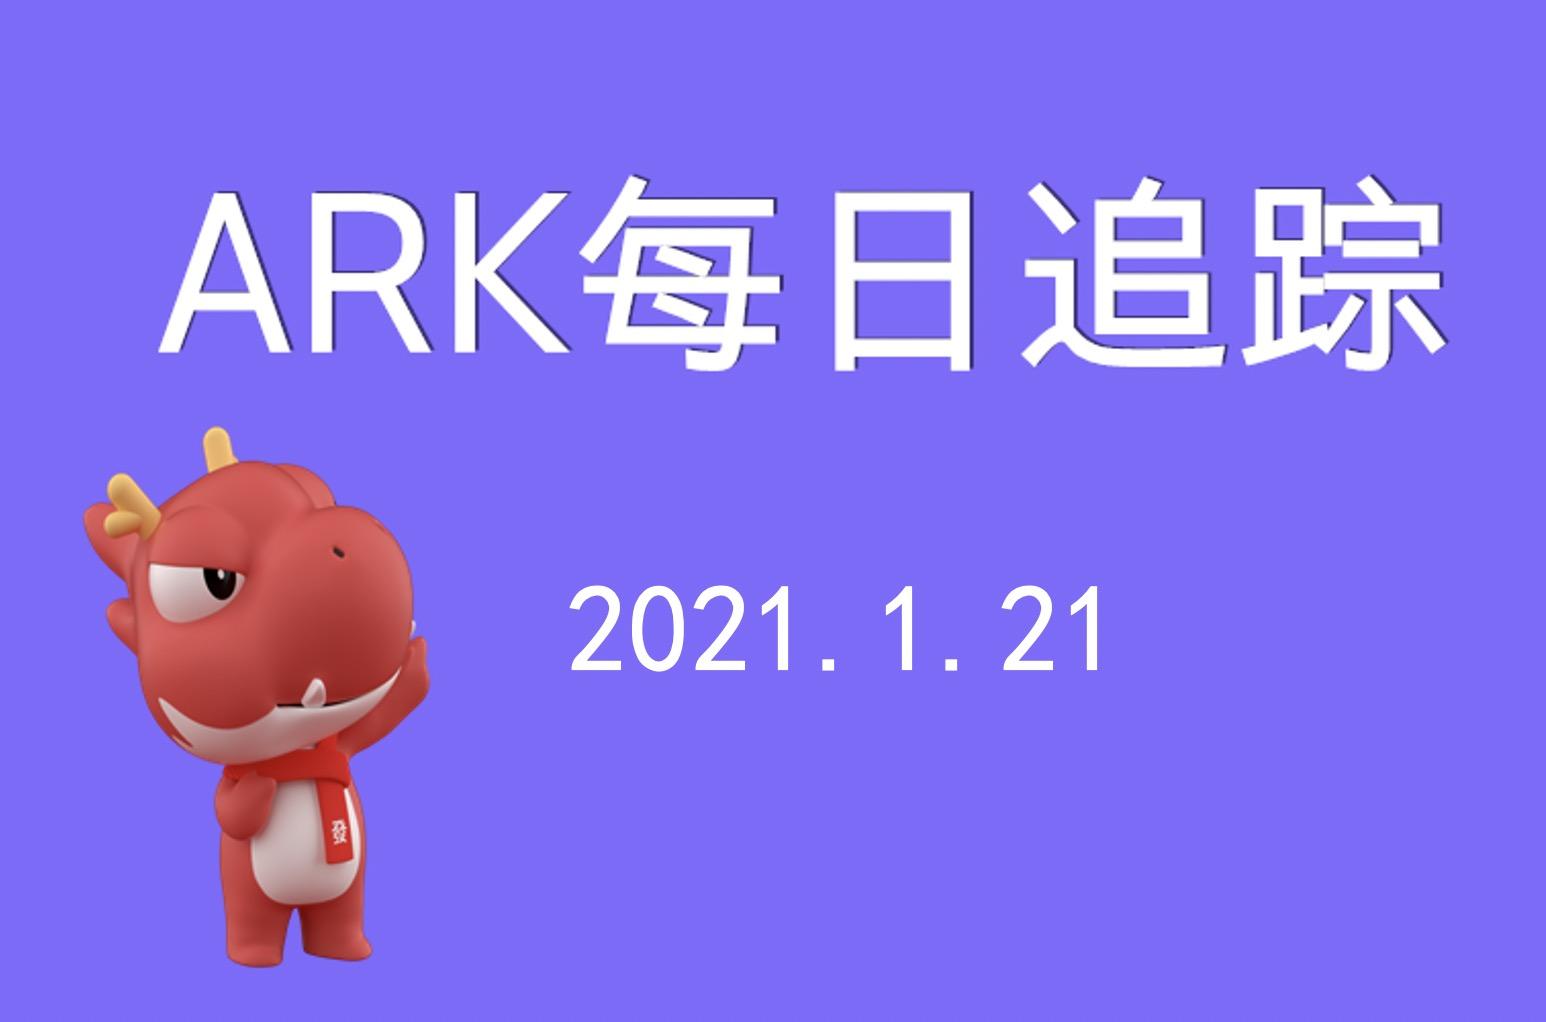 ARK每日追踪 | 继续大买腾讯!移卡、百度亦获女股神青睐